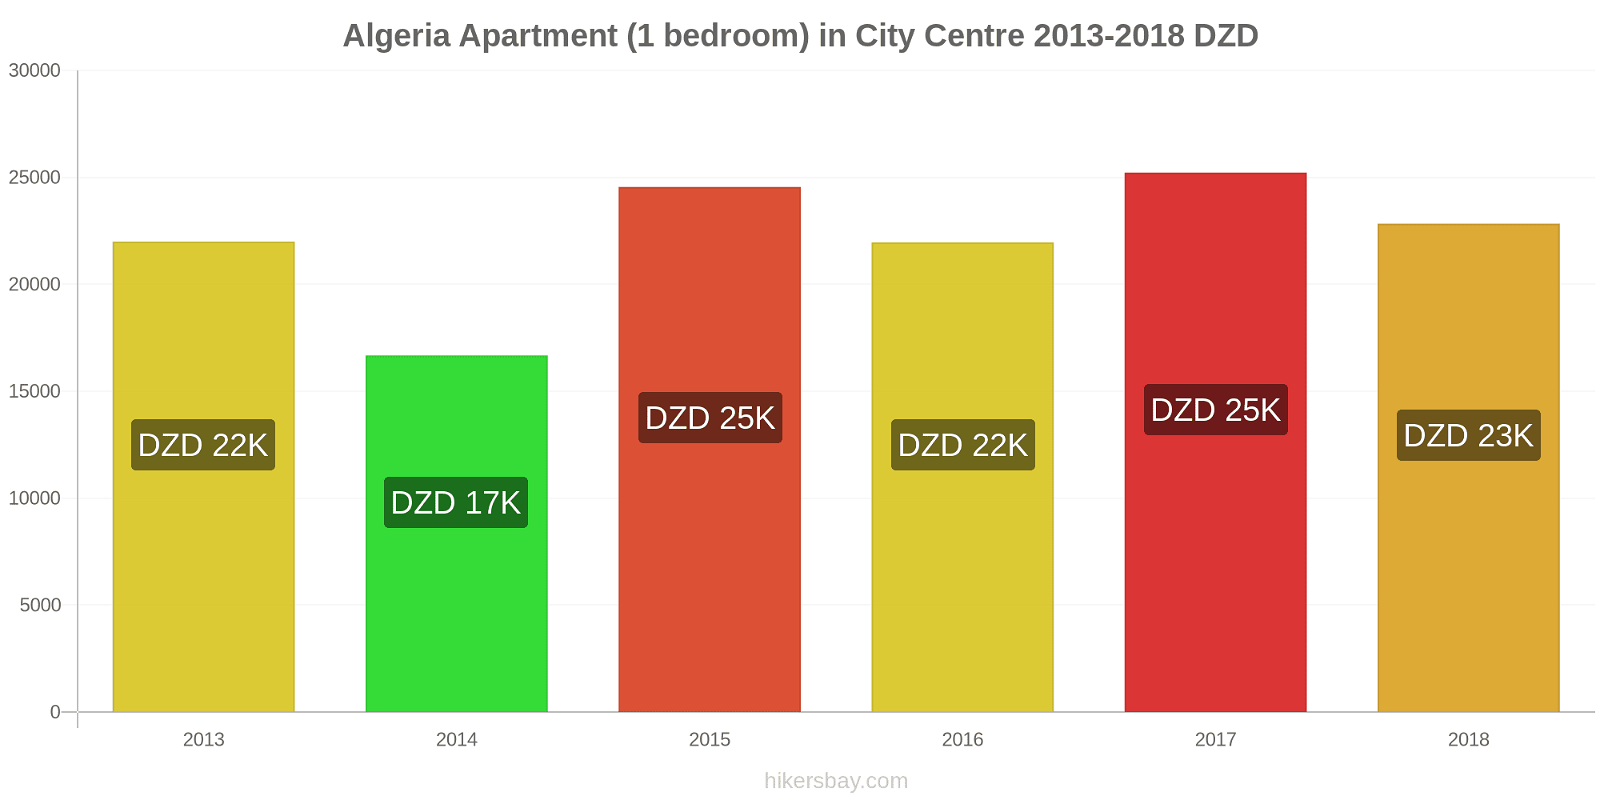 Algeria price changes Apartment (1 bedroom) in City Centre hikersbay.com